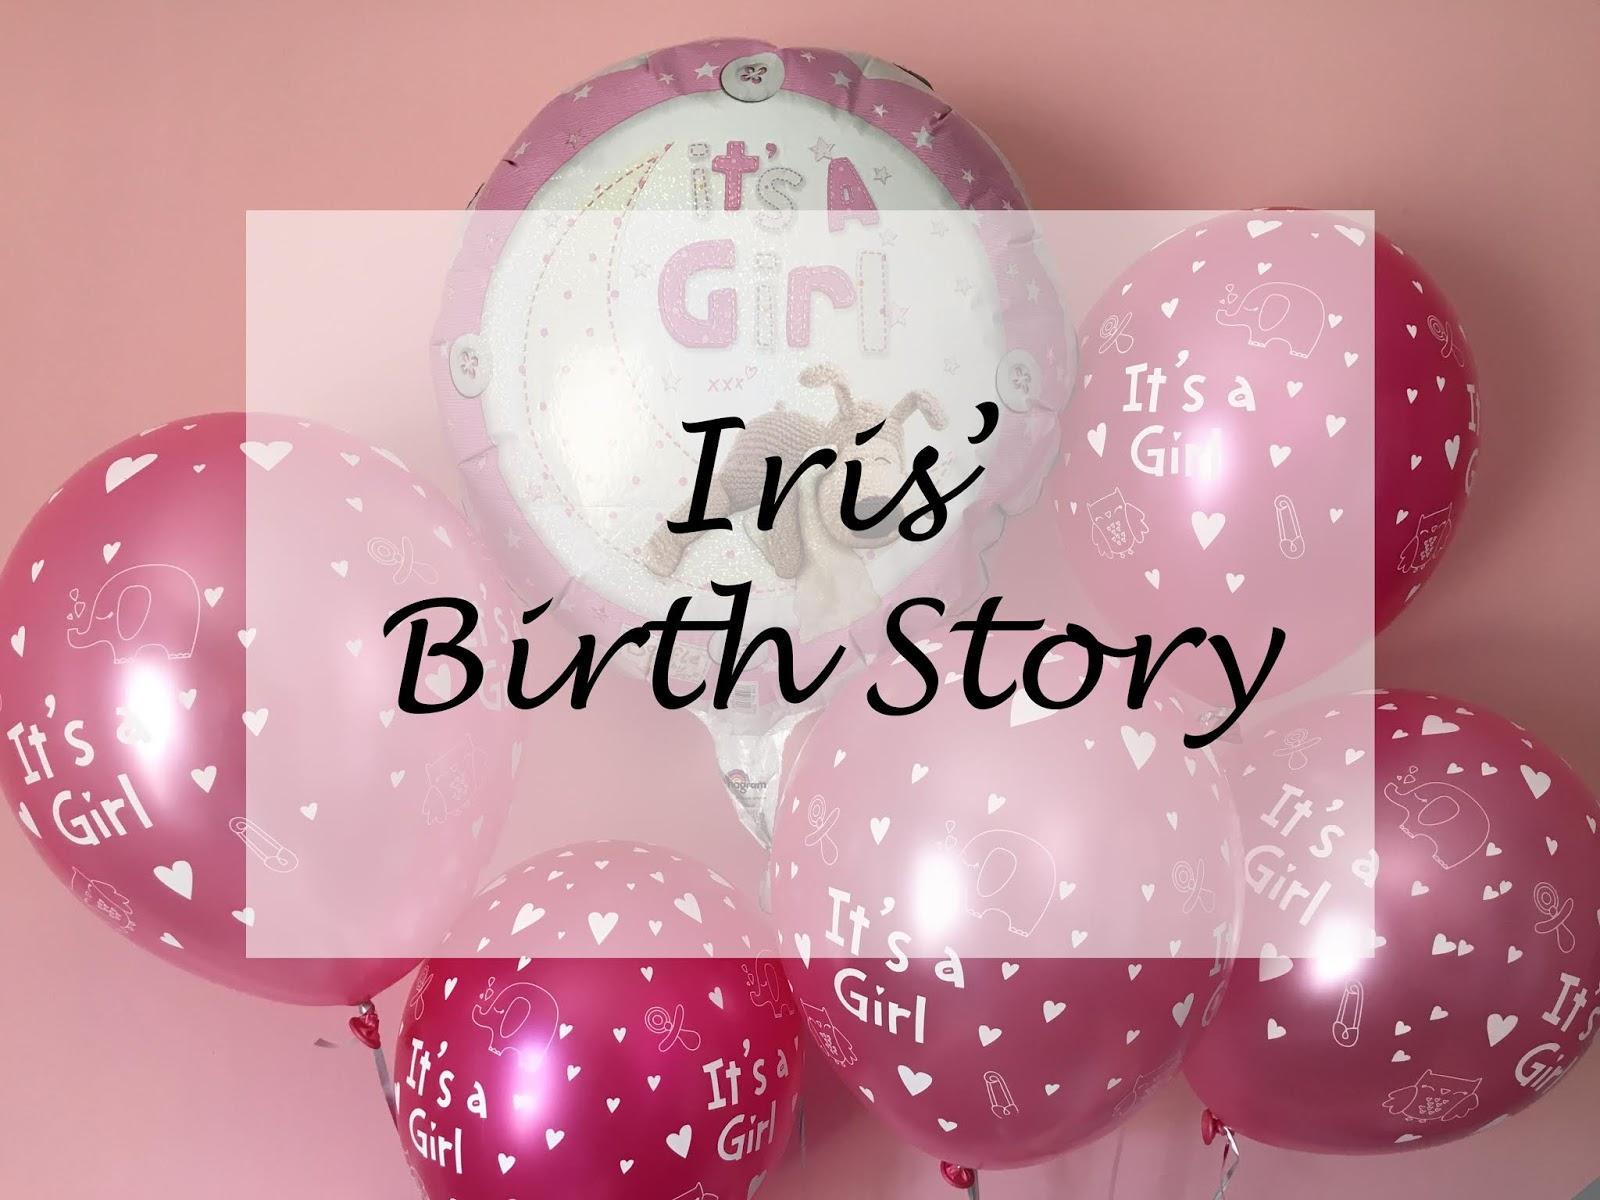 Iris' Birth Story